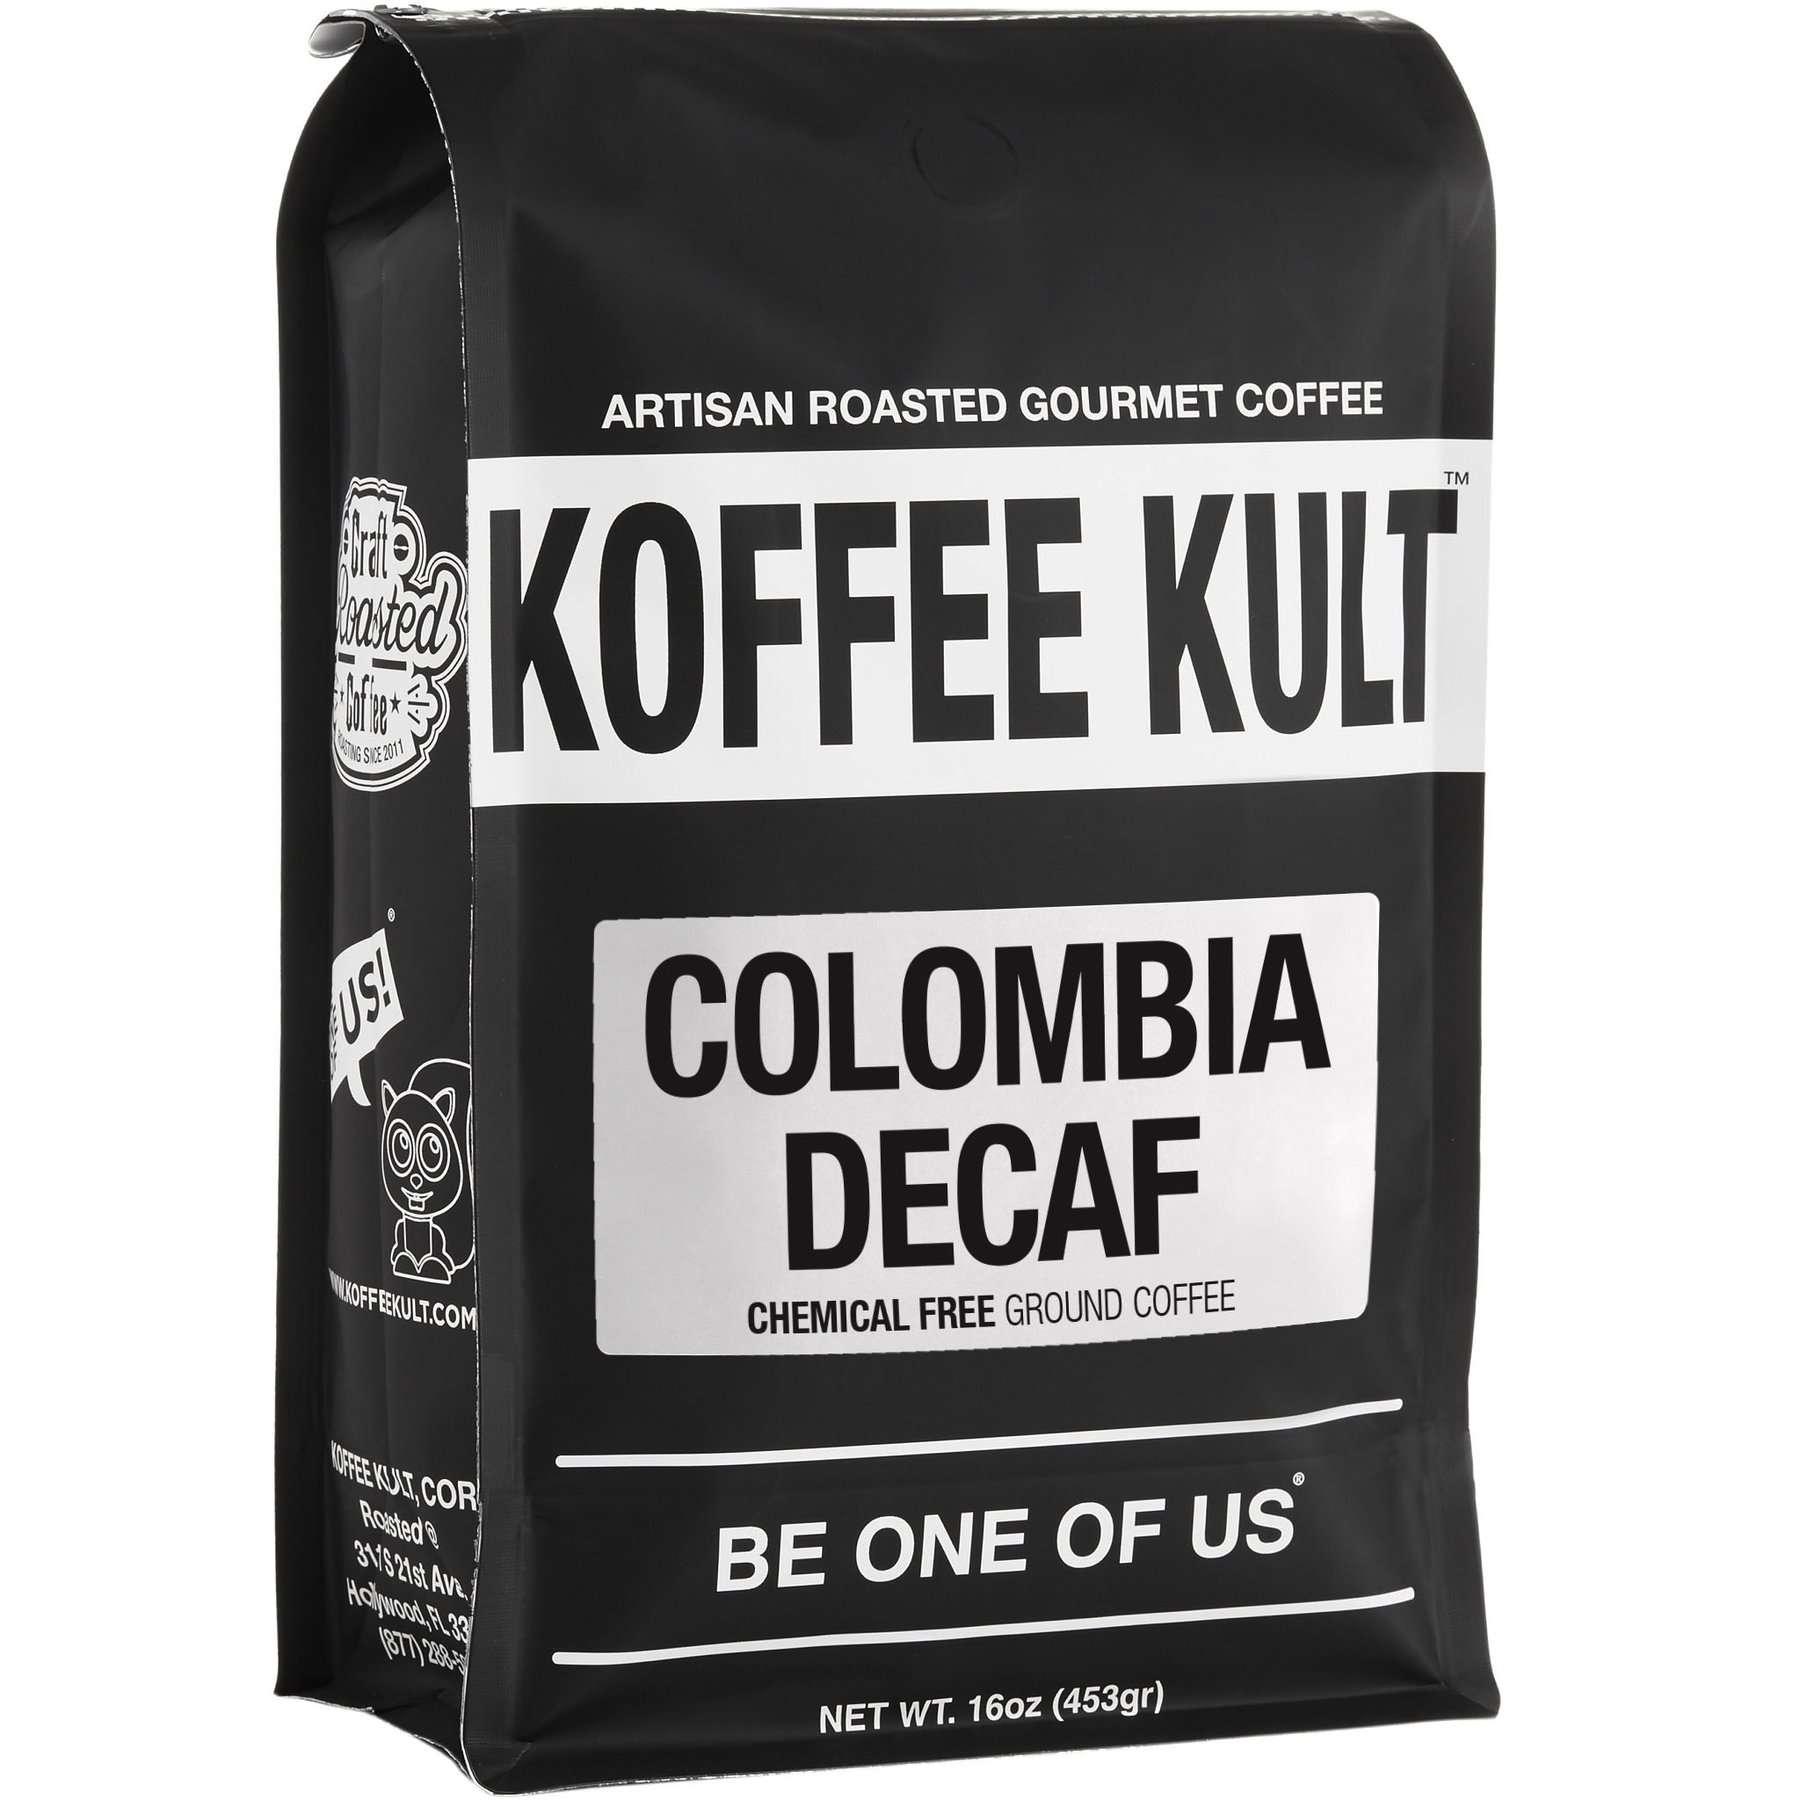 Koffee Kult Colombian Decaf Coffee